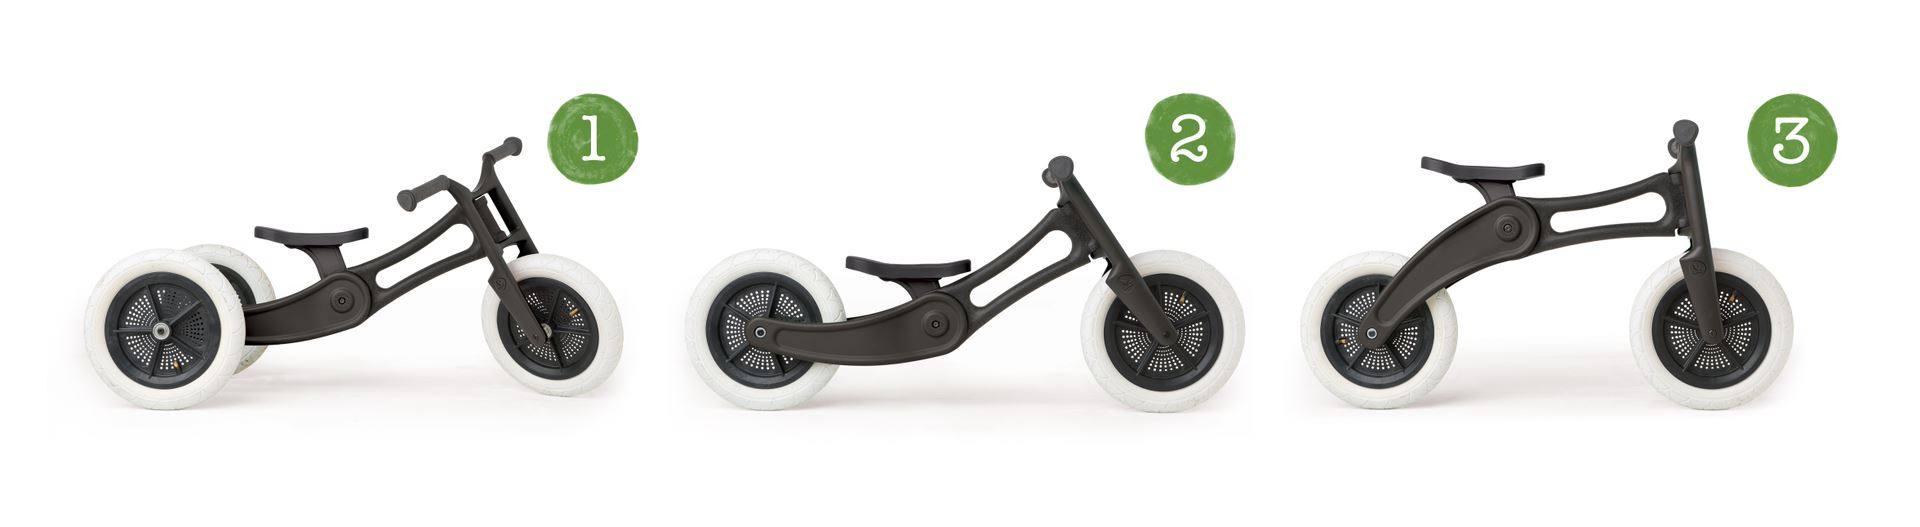 Wishbone Laufrad 3-in-1 RE 6